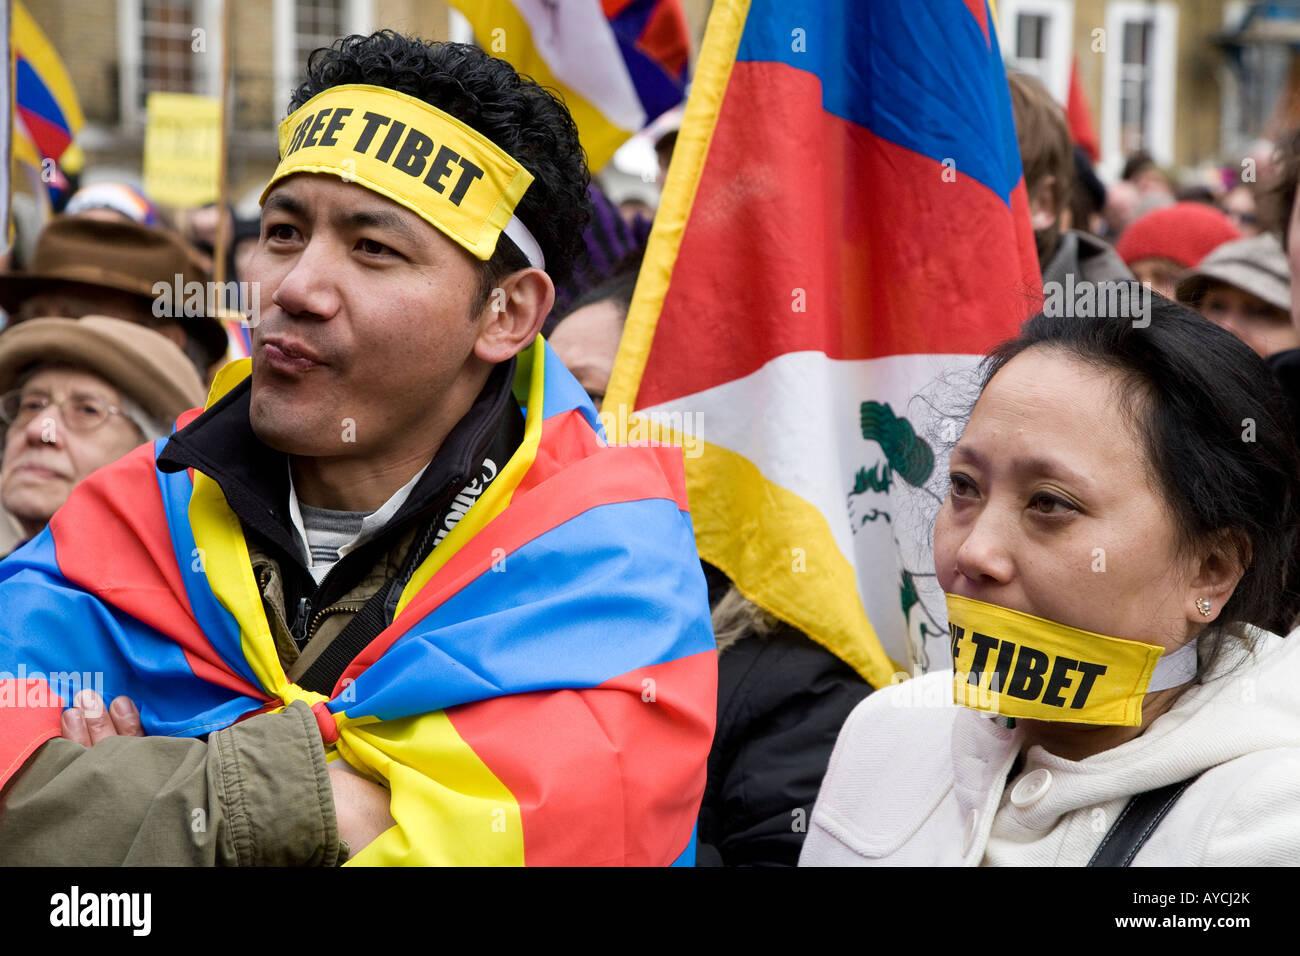 Tibetan Protesters At The Free Tibet Demo  London U.K. Europe - Stock Image